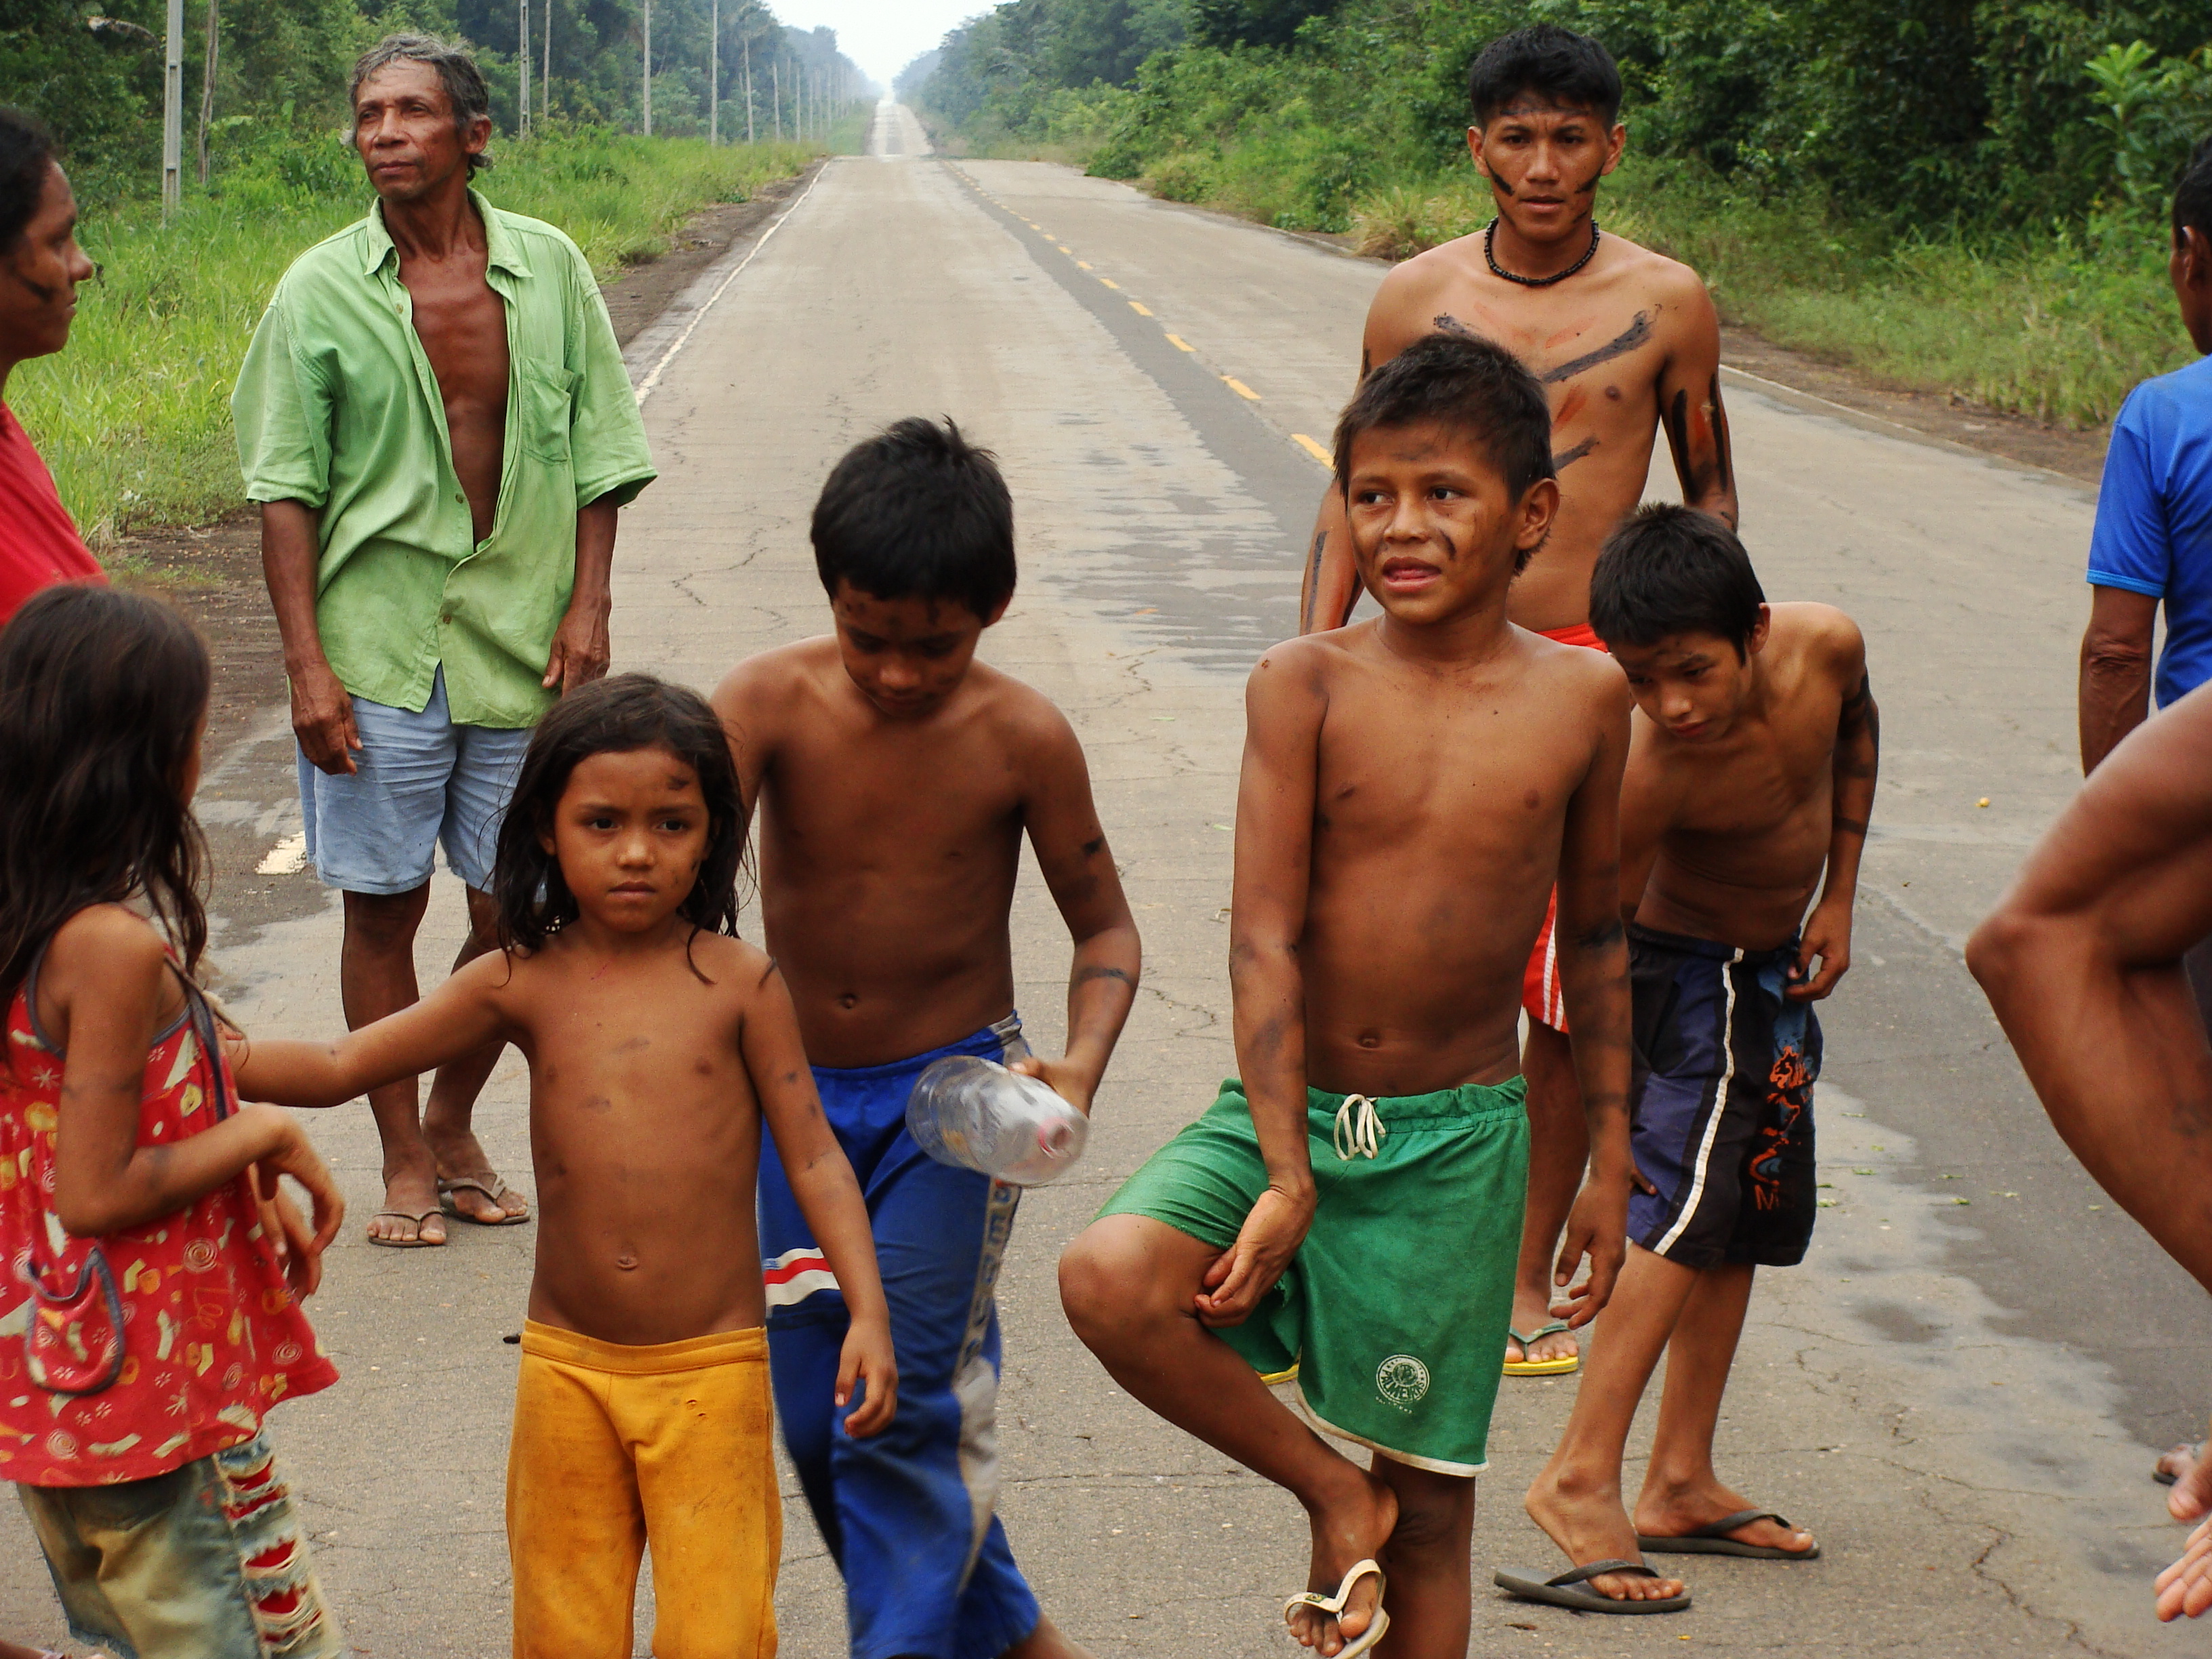 tribe kids File:Brazilian Indian tribe kids.jpg